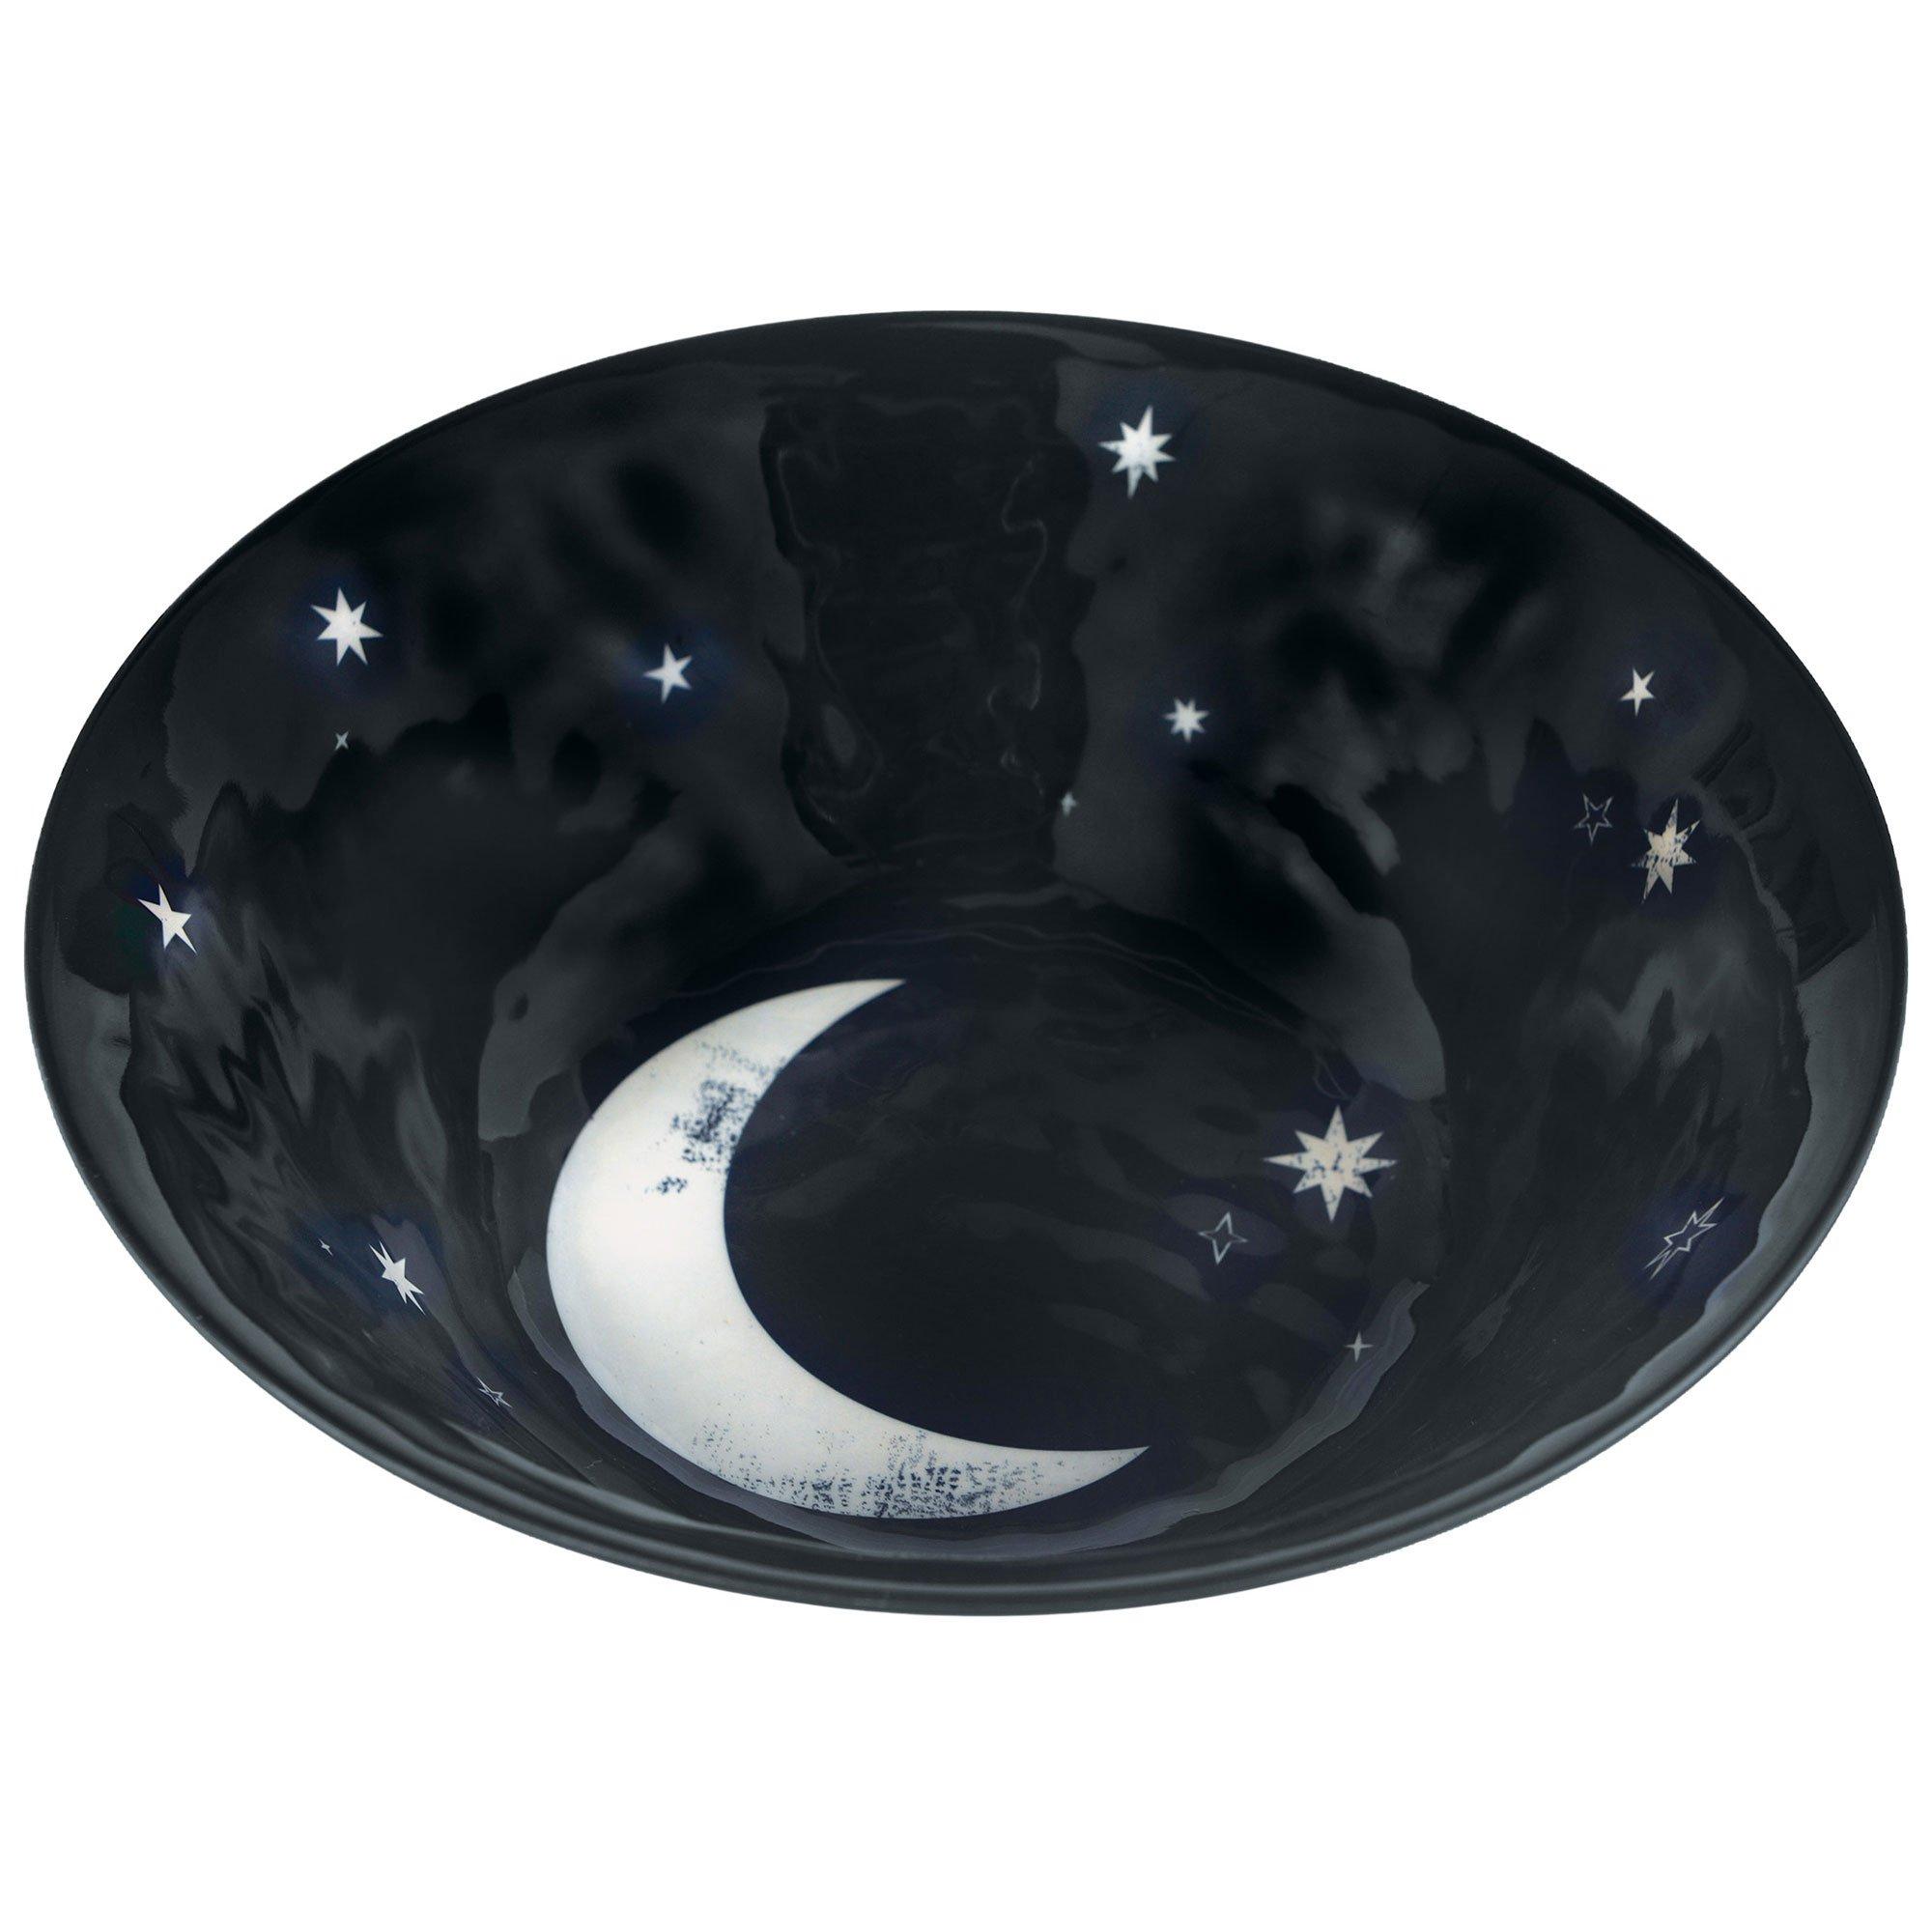 Halloween Classic Black & White Melamine Serving Bowl